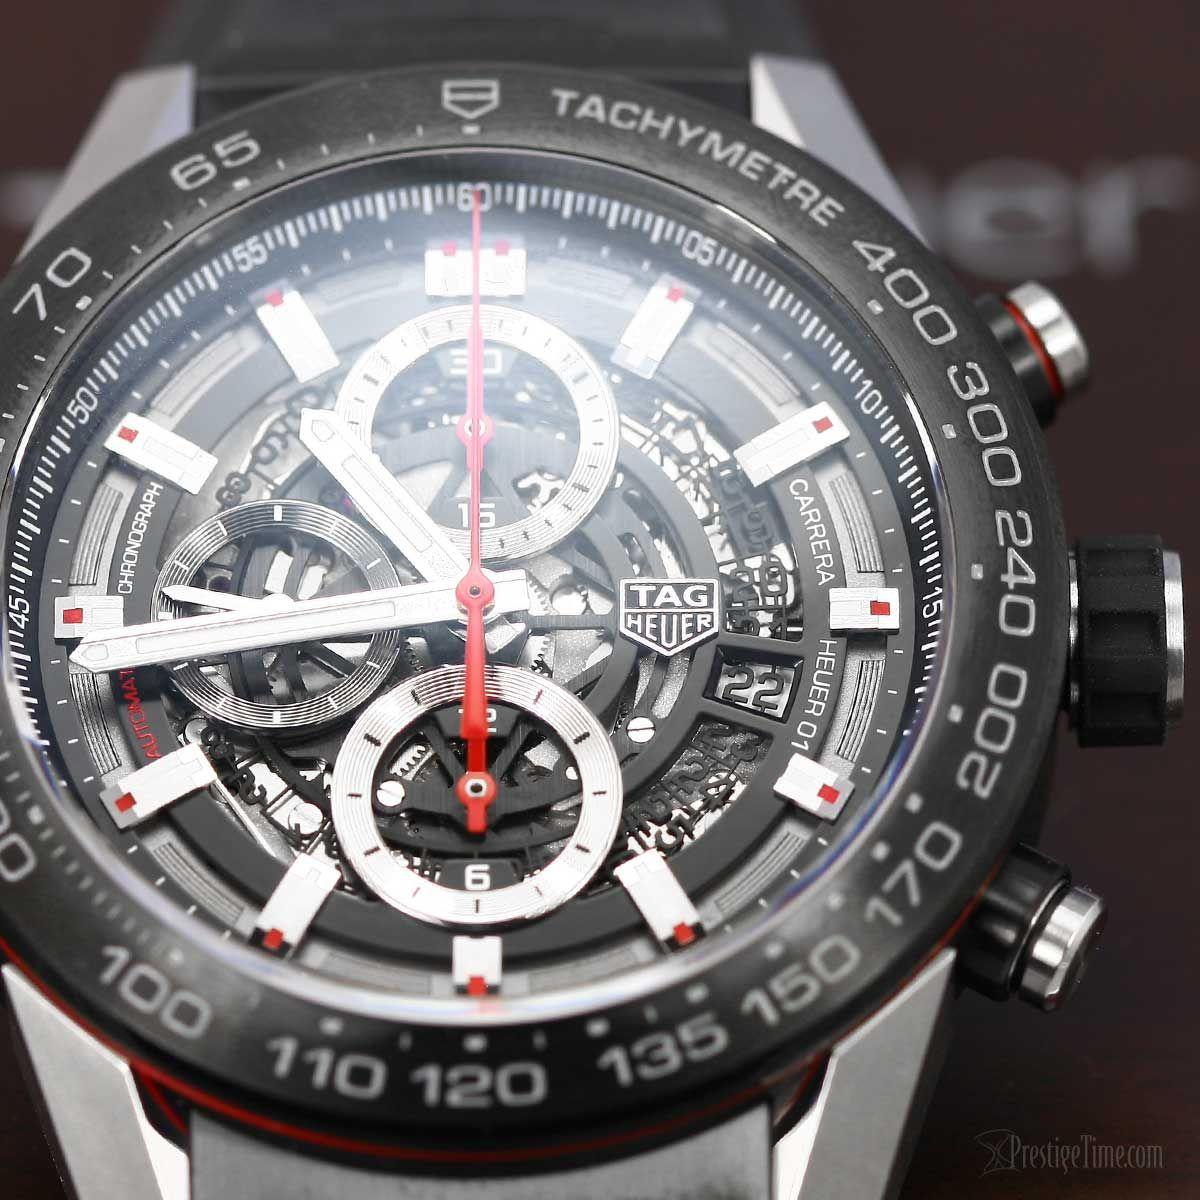 1792c48b9fb TAG Heuer Carrera Calibre Heuer 01 Skeleton Chronograph 45mm Men s Watch.   TAGHeuer  Carrera  Calibre  Heuer01